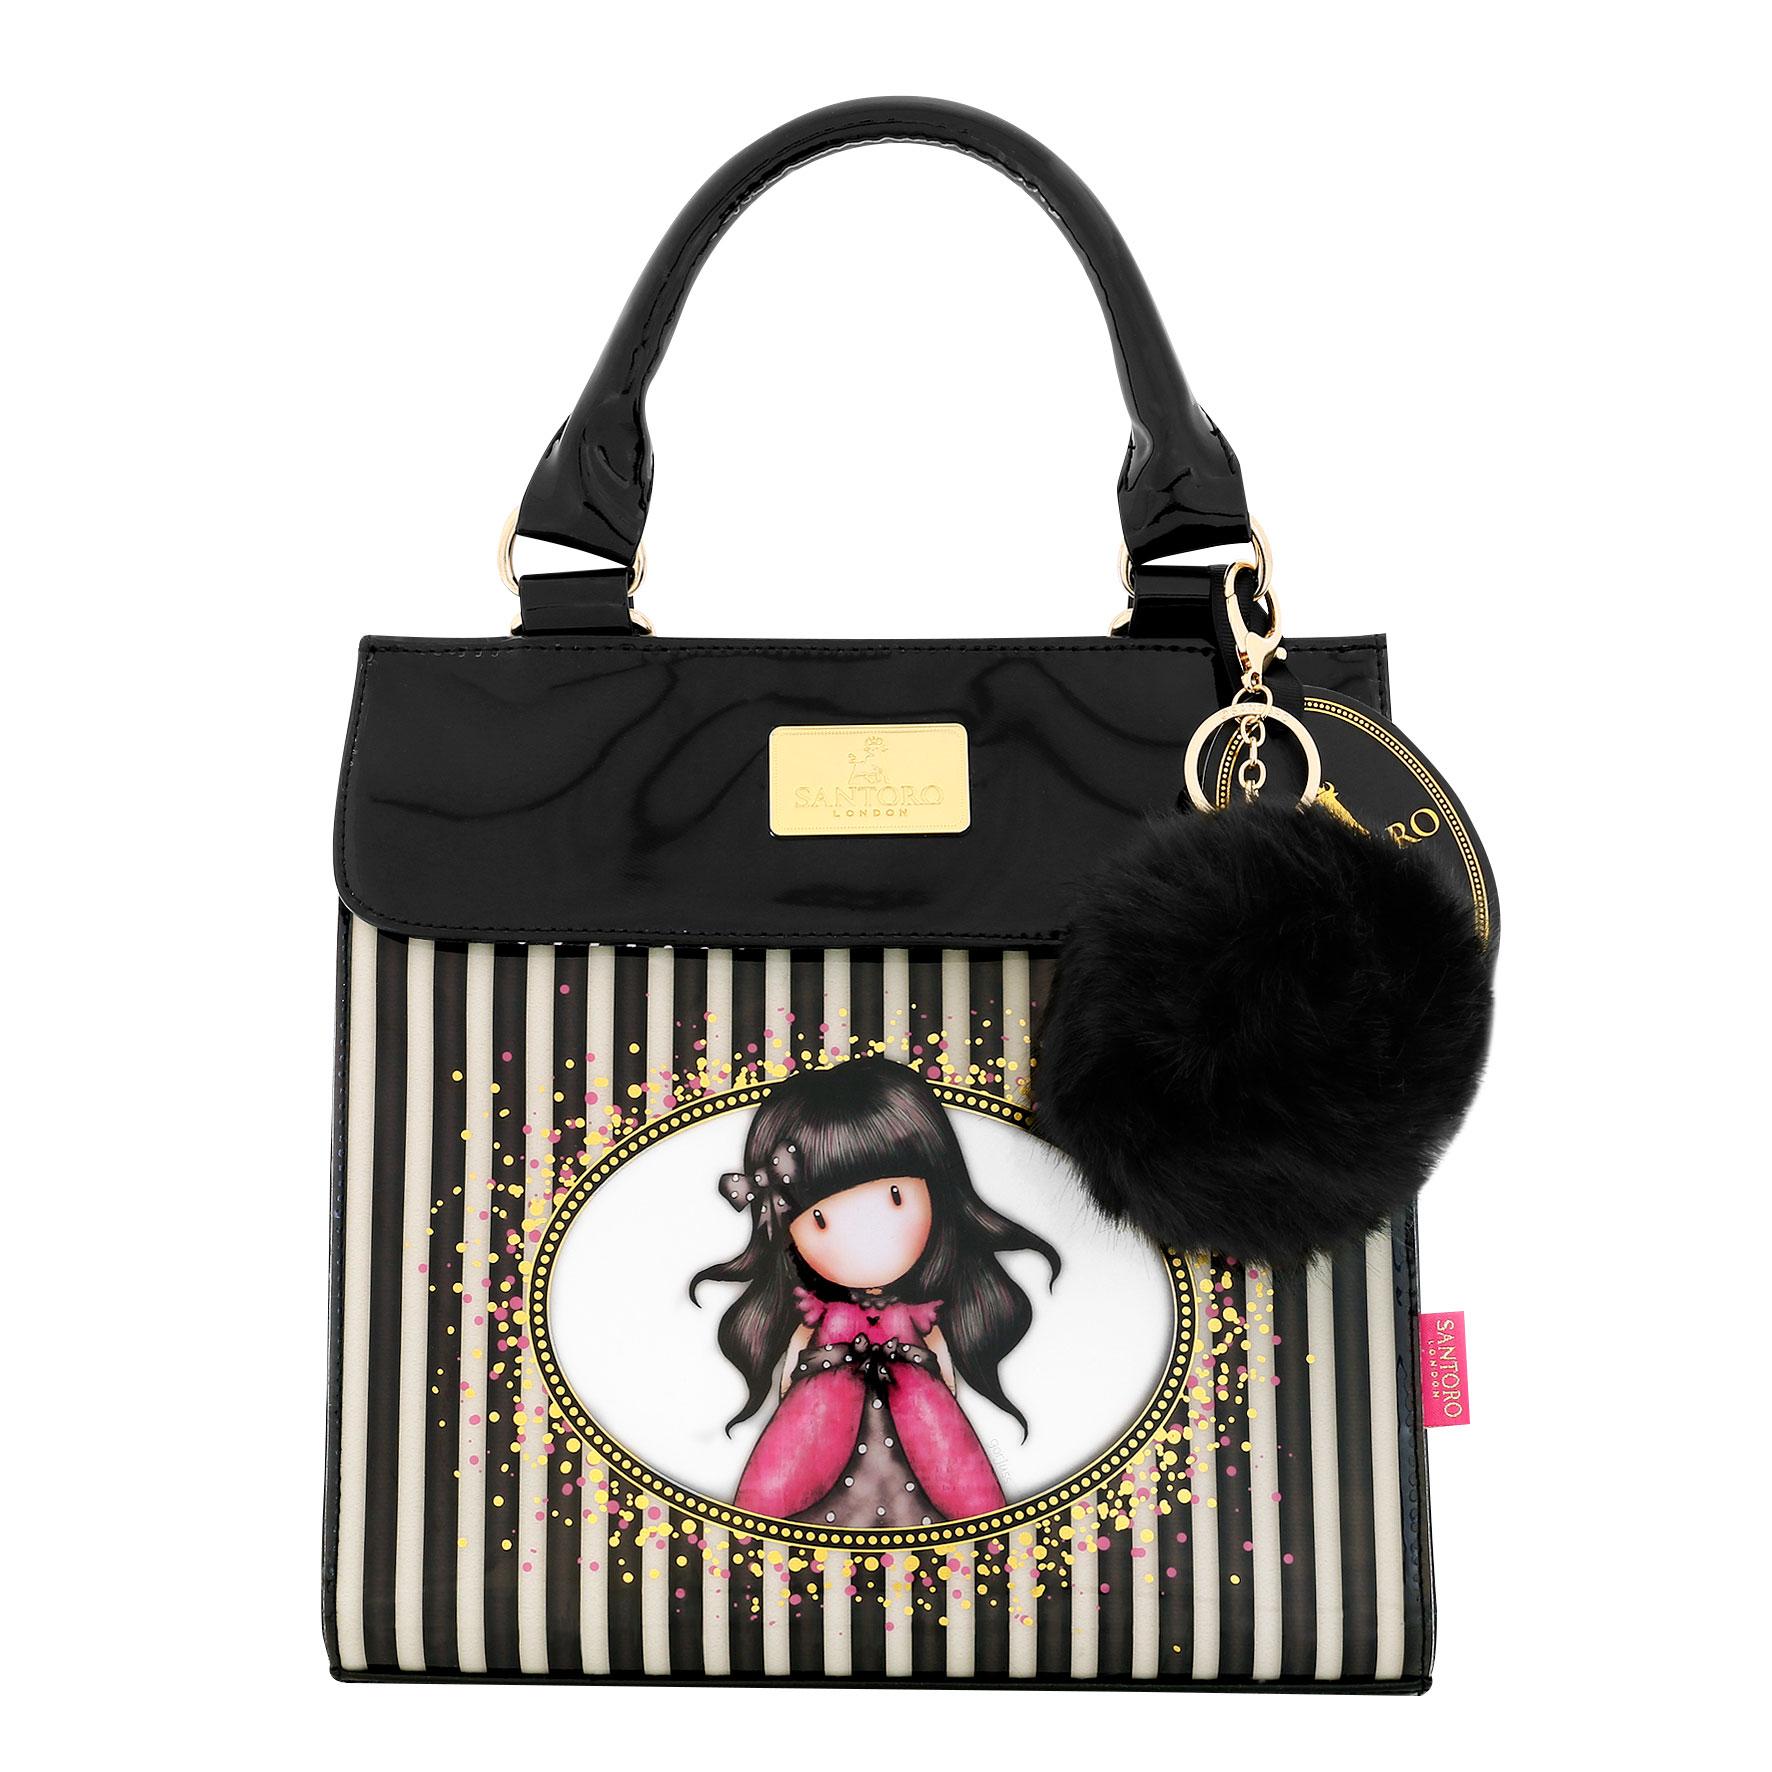 Santoro London - Kabelka do Ruky (menší) - Gorjuss Stripes - Ladybird Černá, bílá, růžová;Černá, bílá, růžová